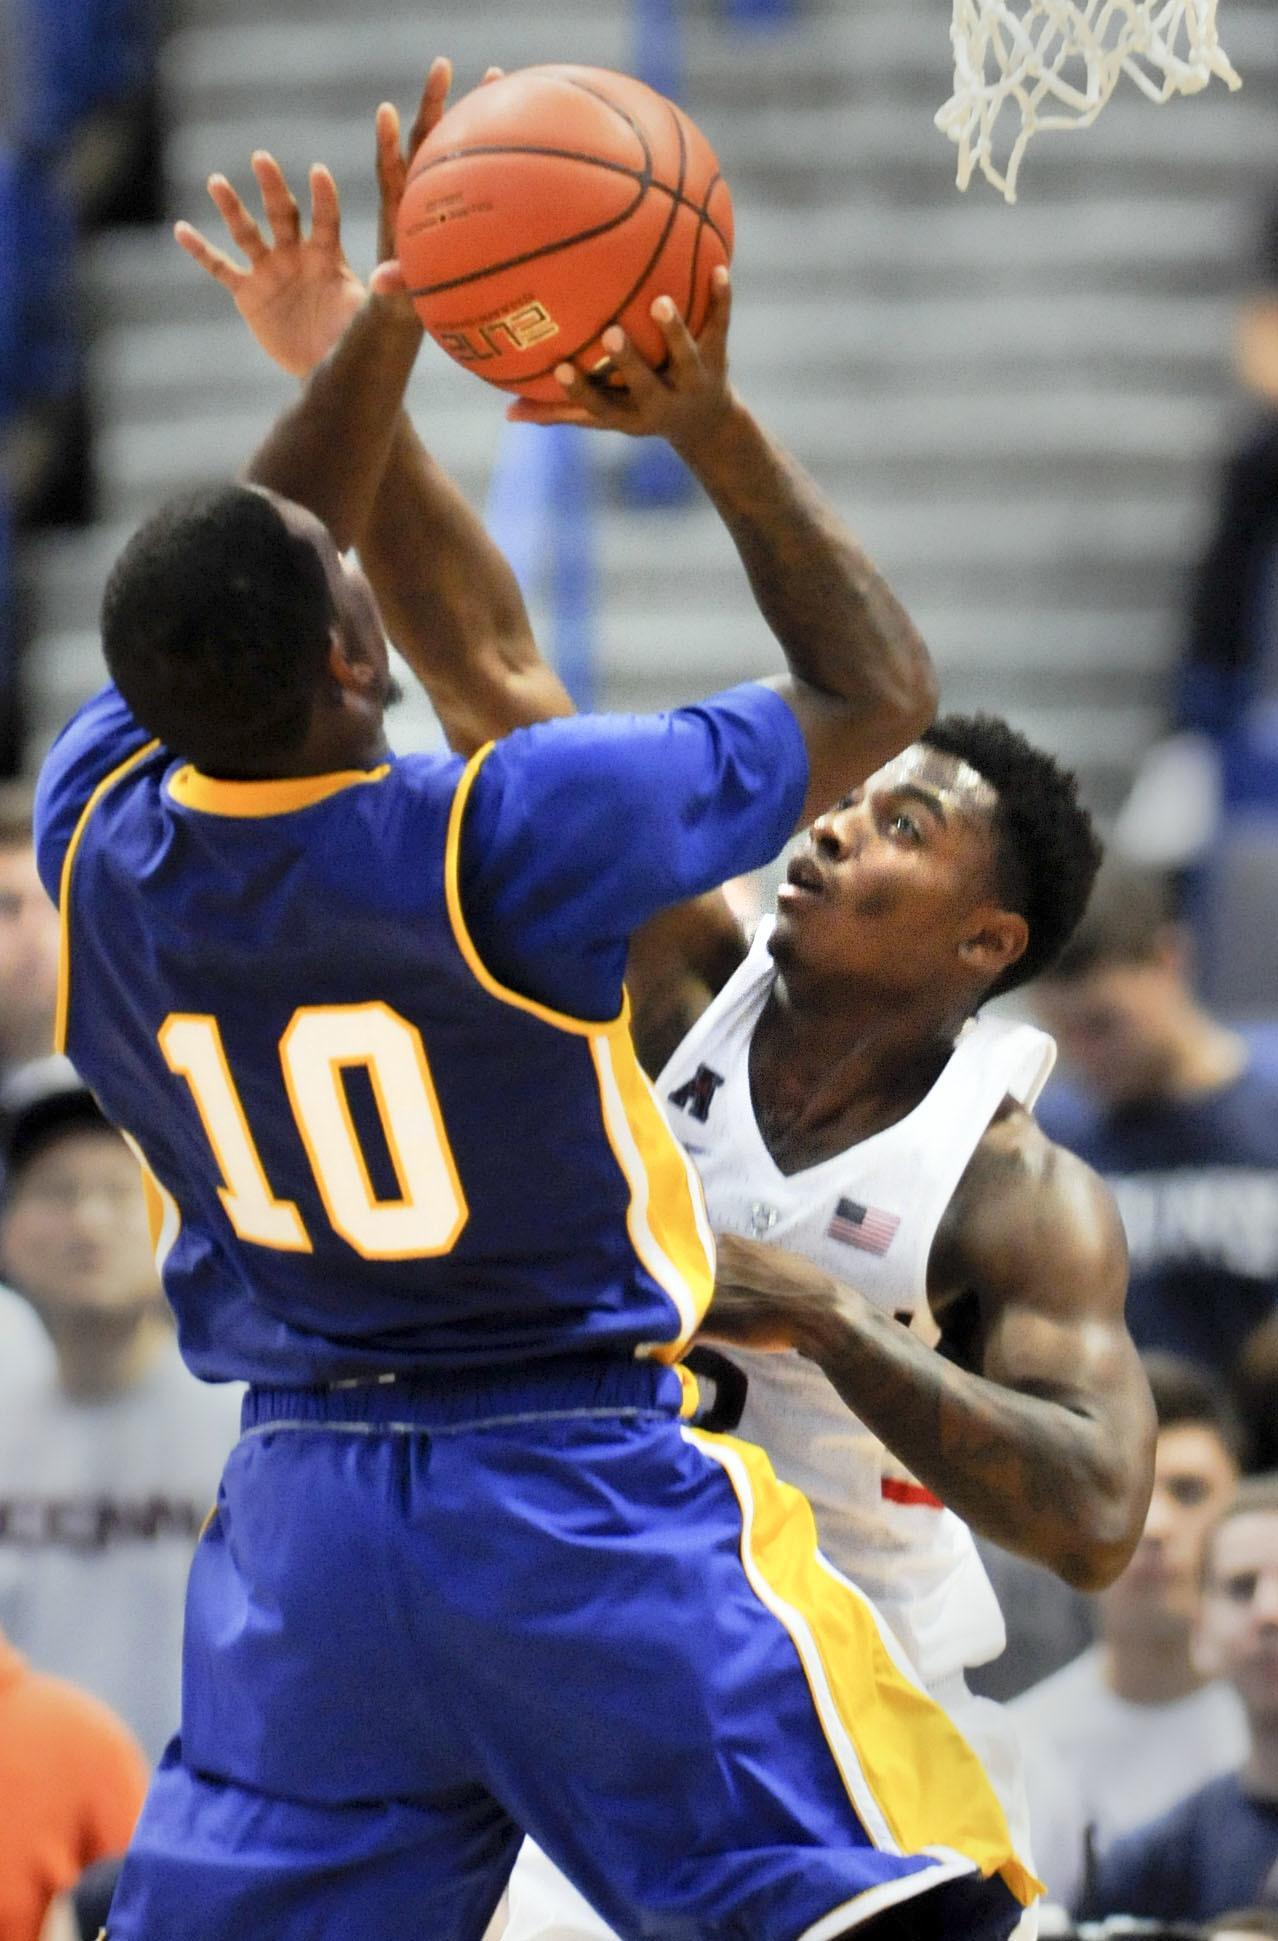 Bridgeport's Upchurch nets 33 for UNH, but UConn wins